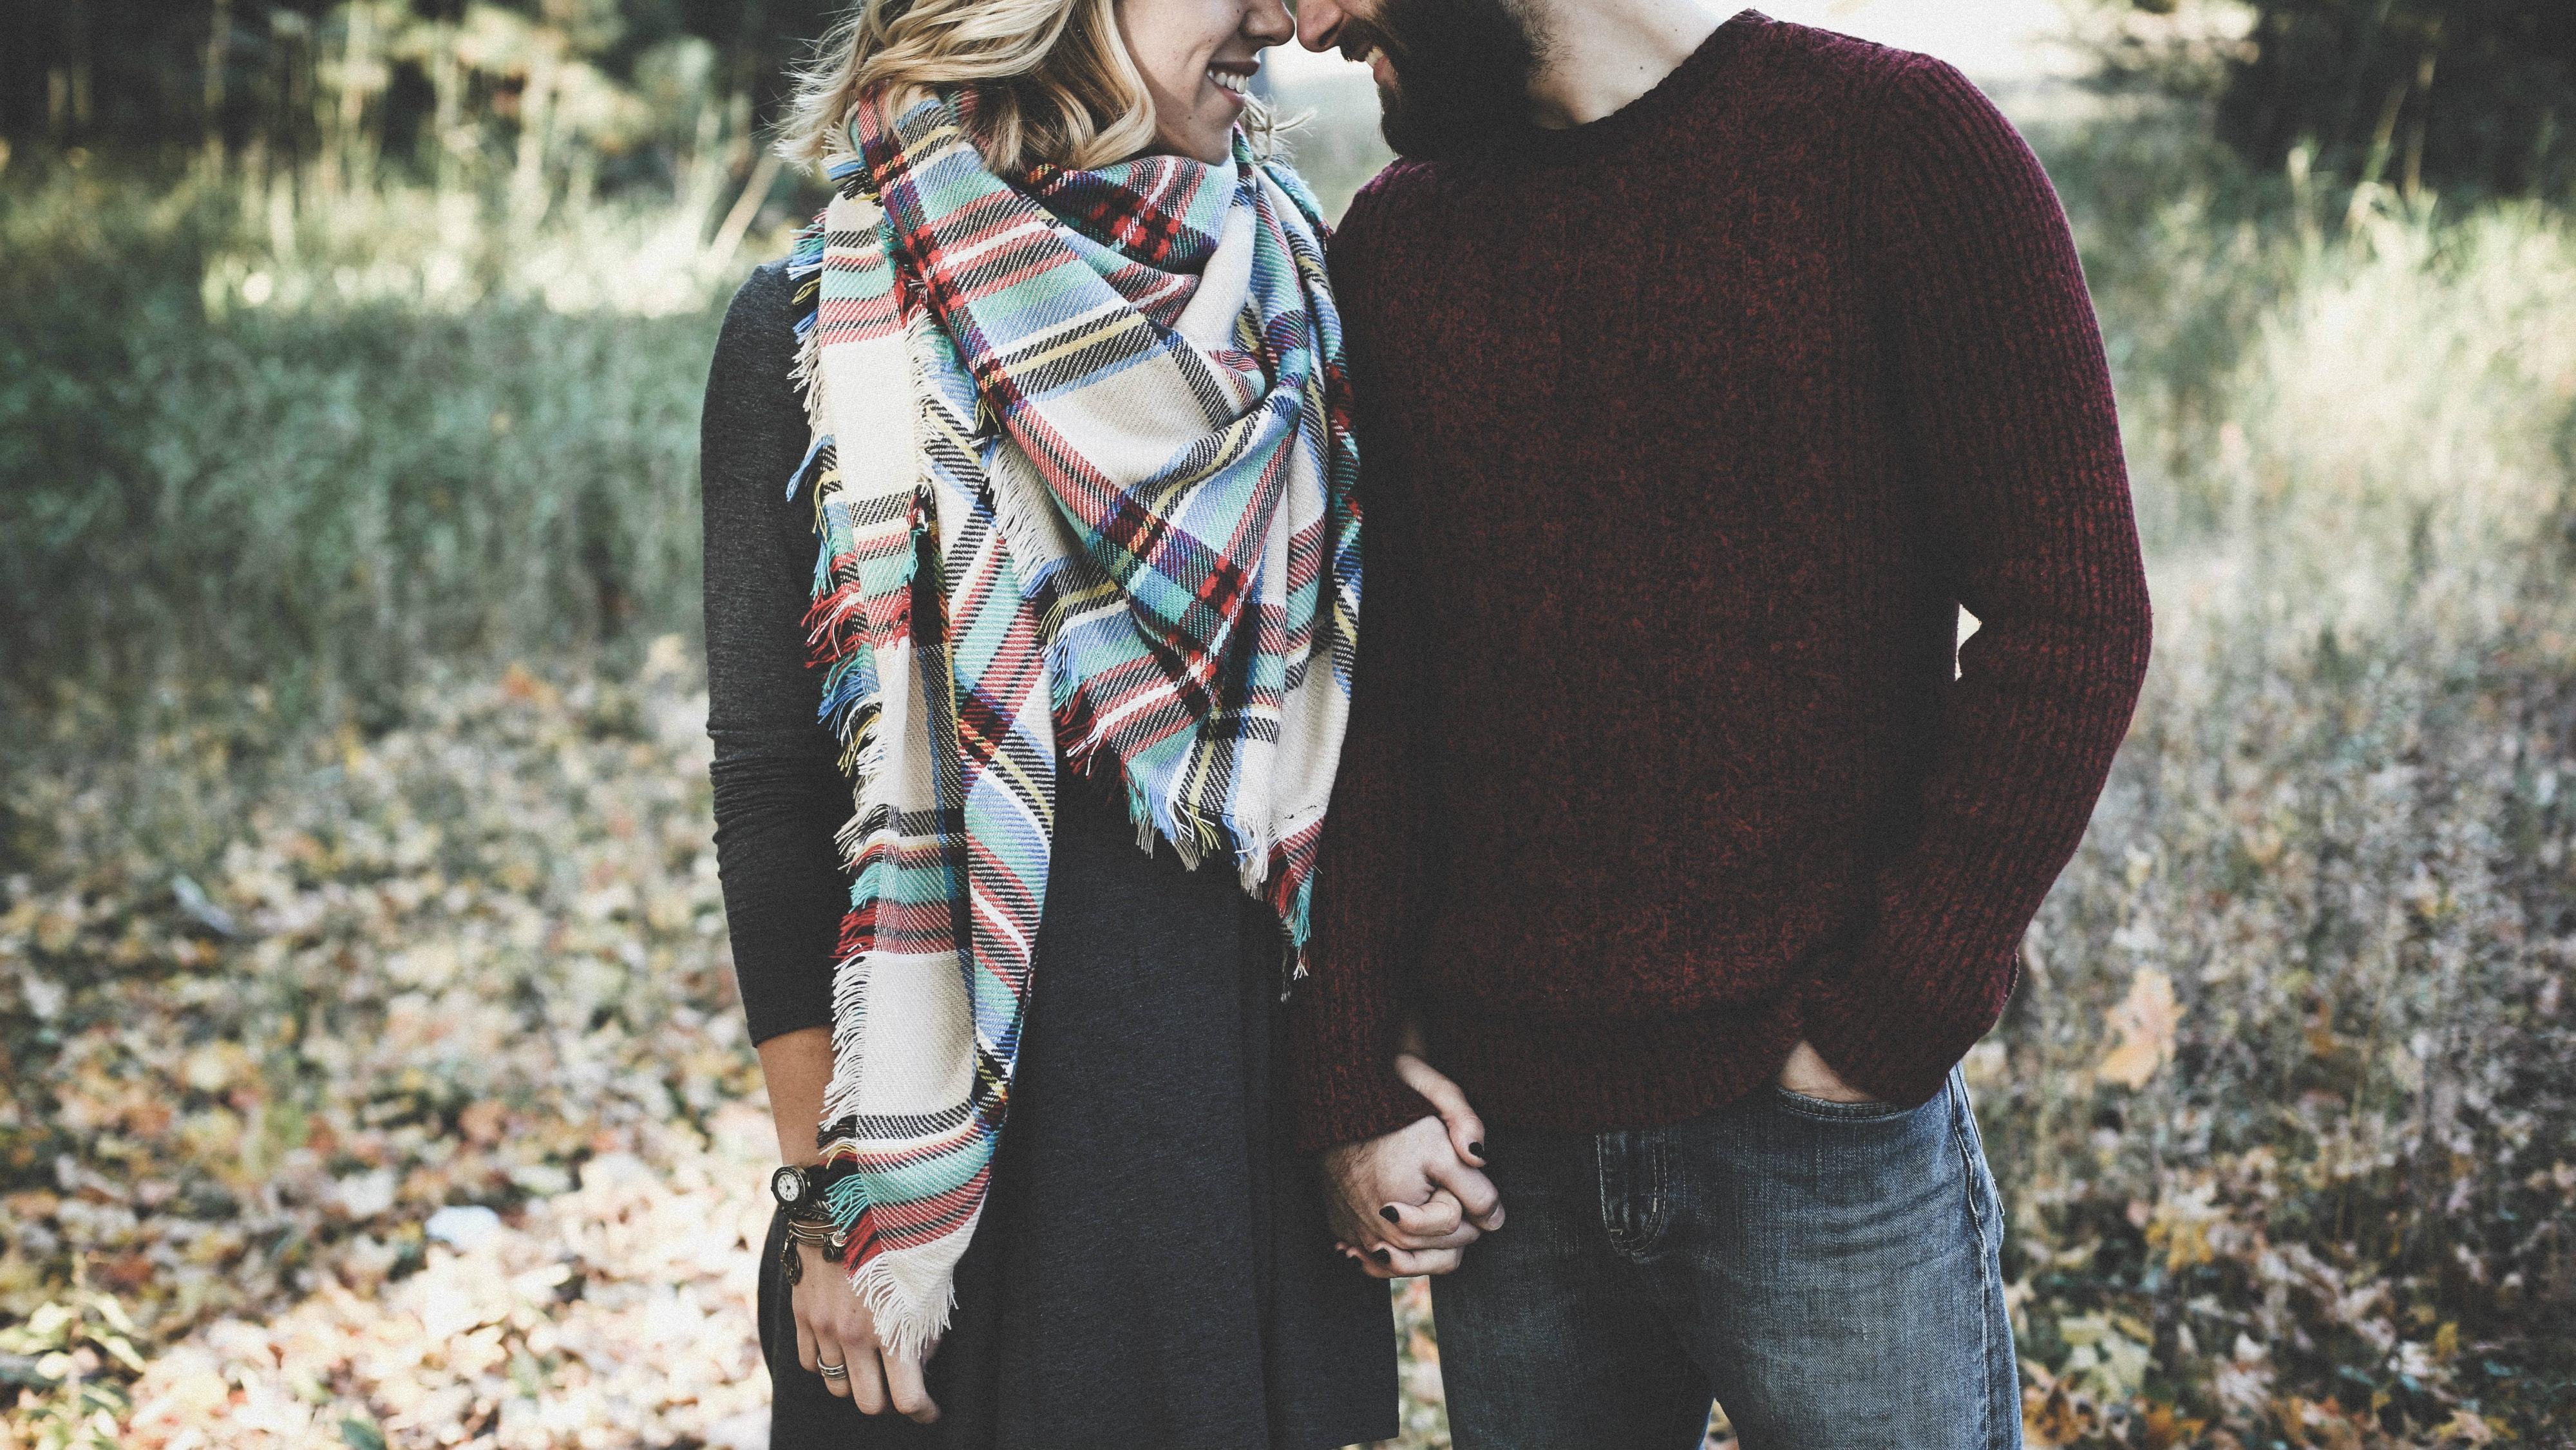 10 principles for christian dating